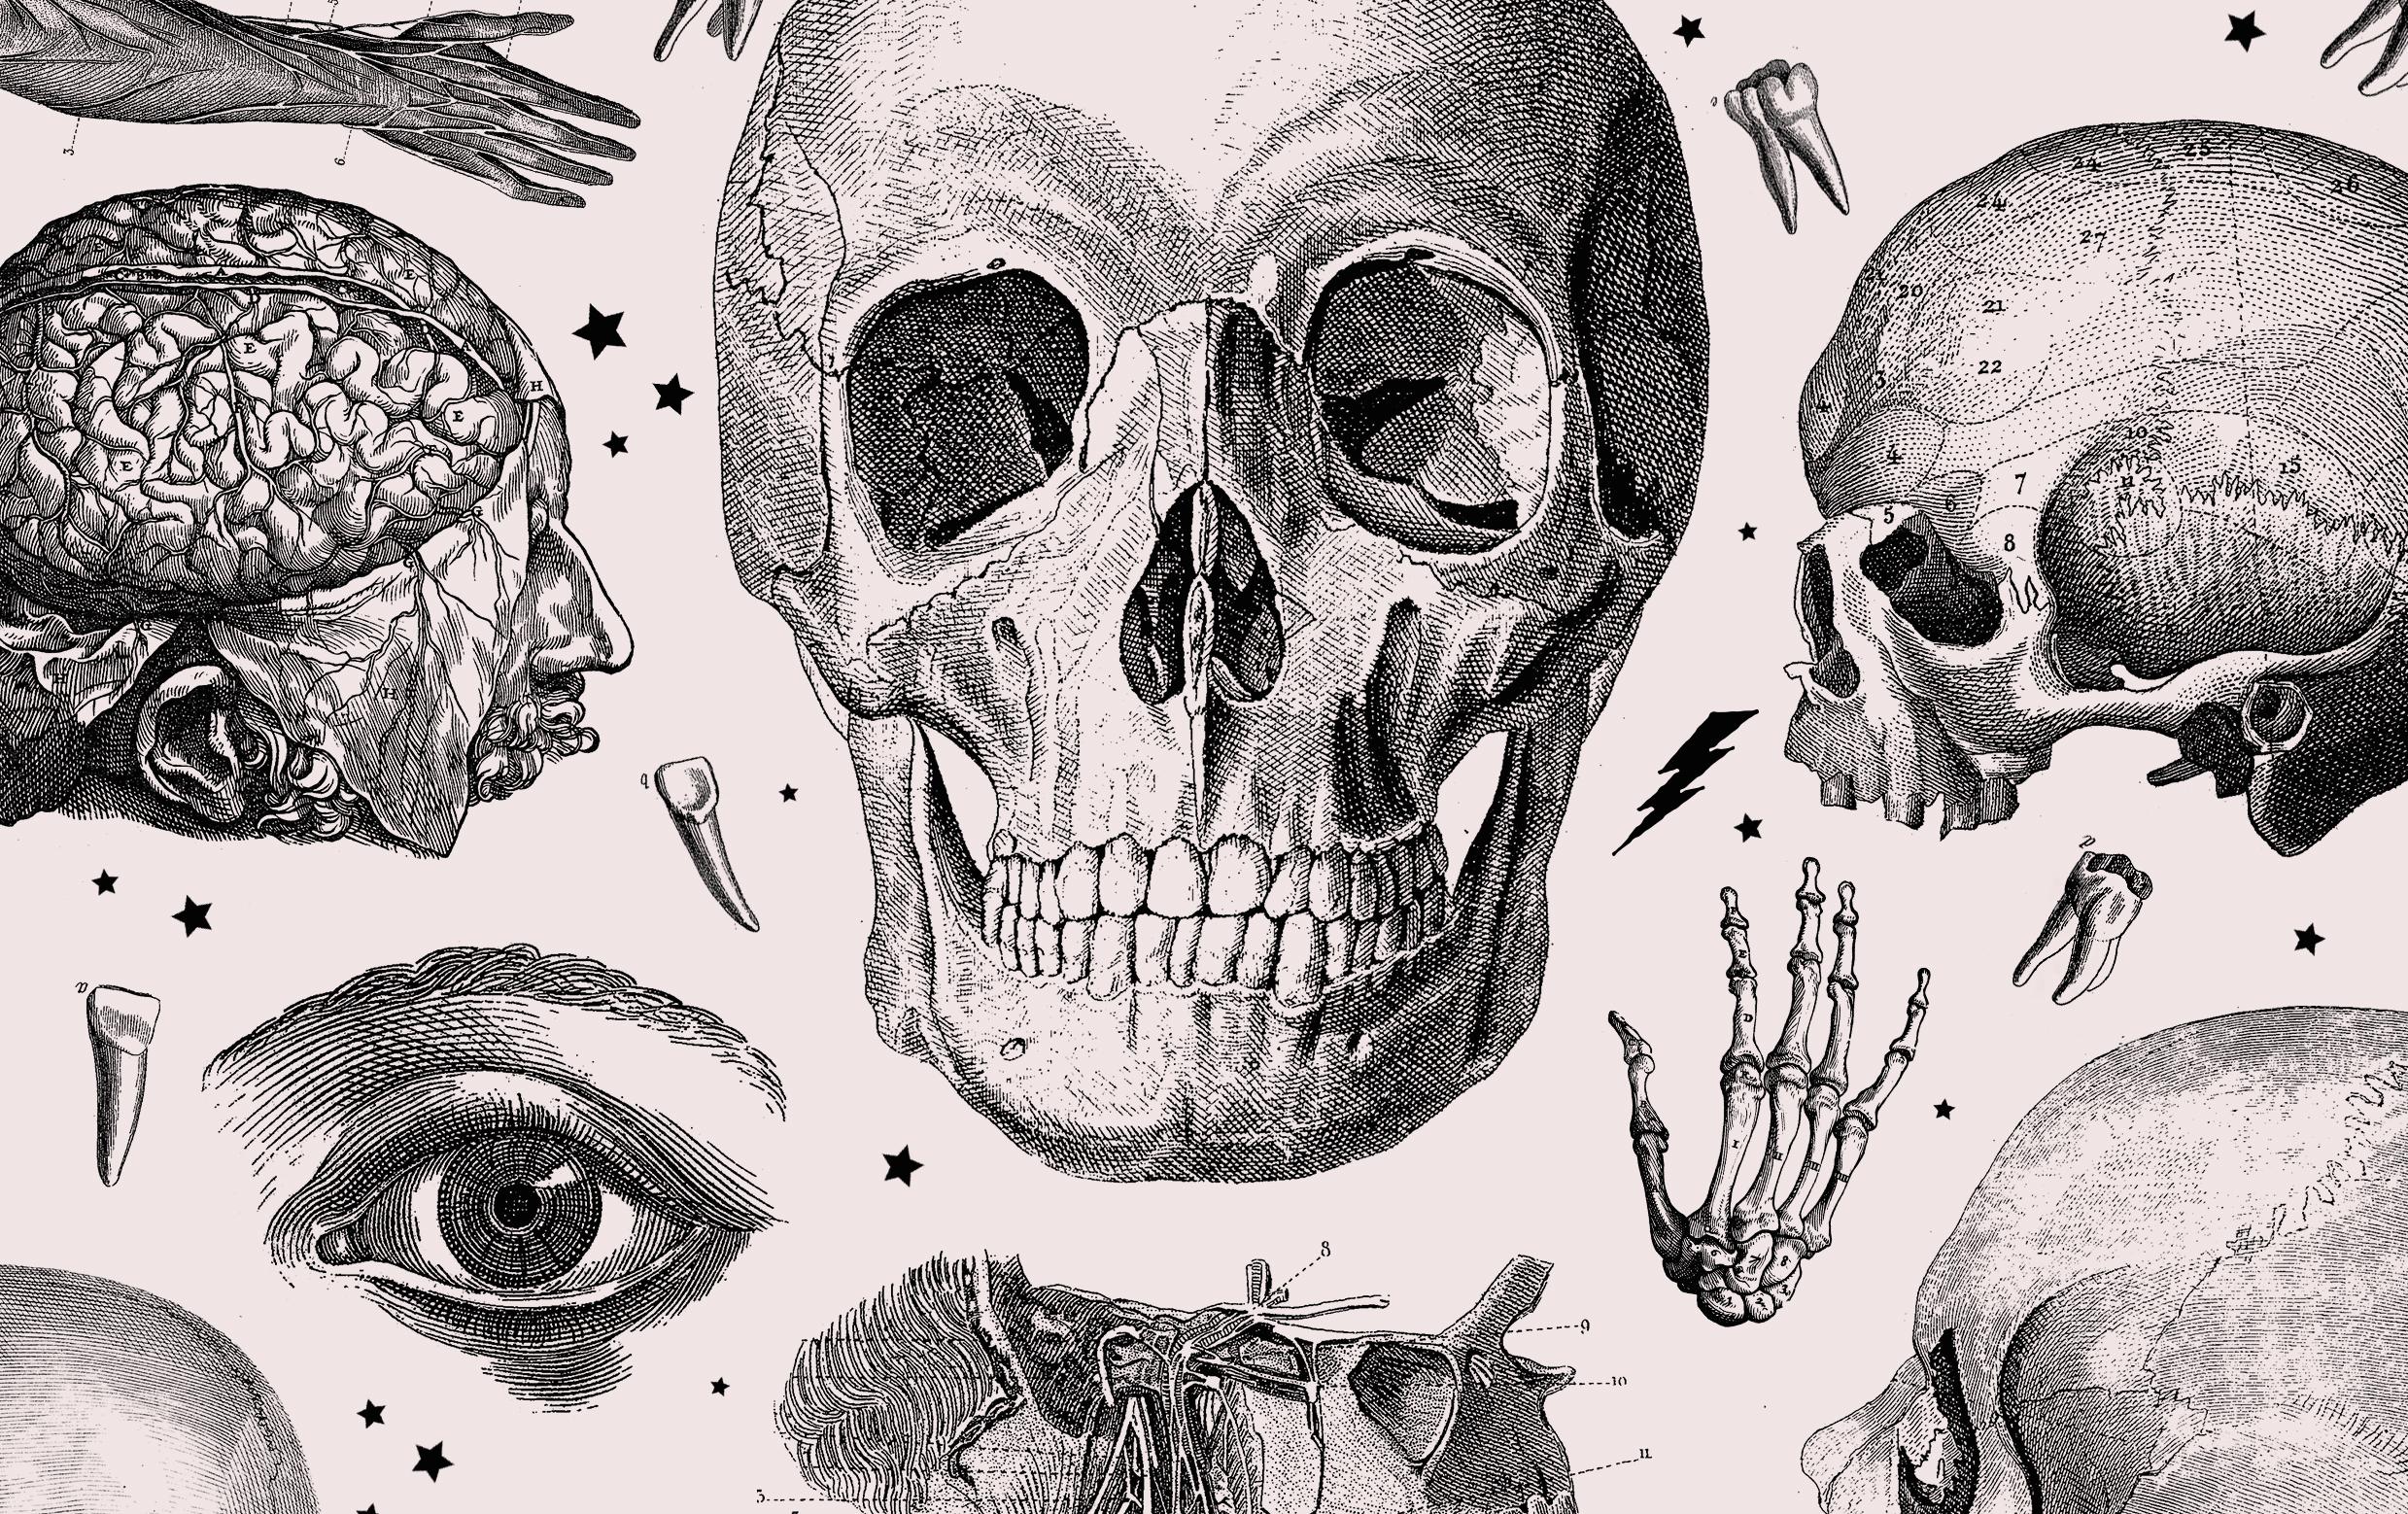 Skulls & Anatomy - Copyright Free Vintage Illustrations For Artists & Designers